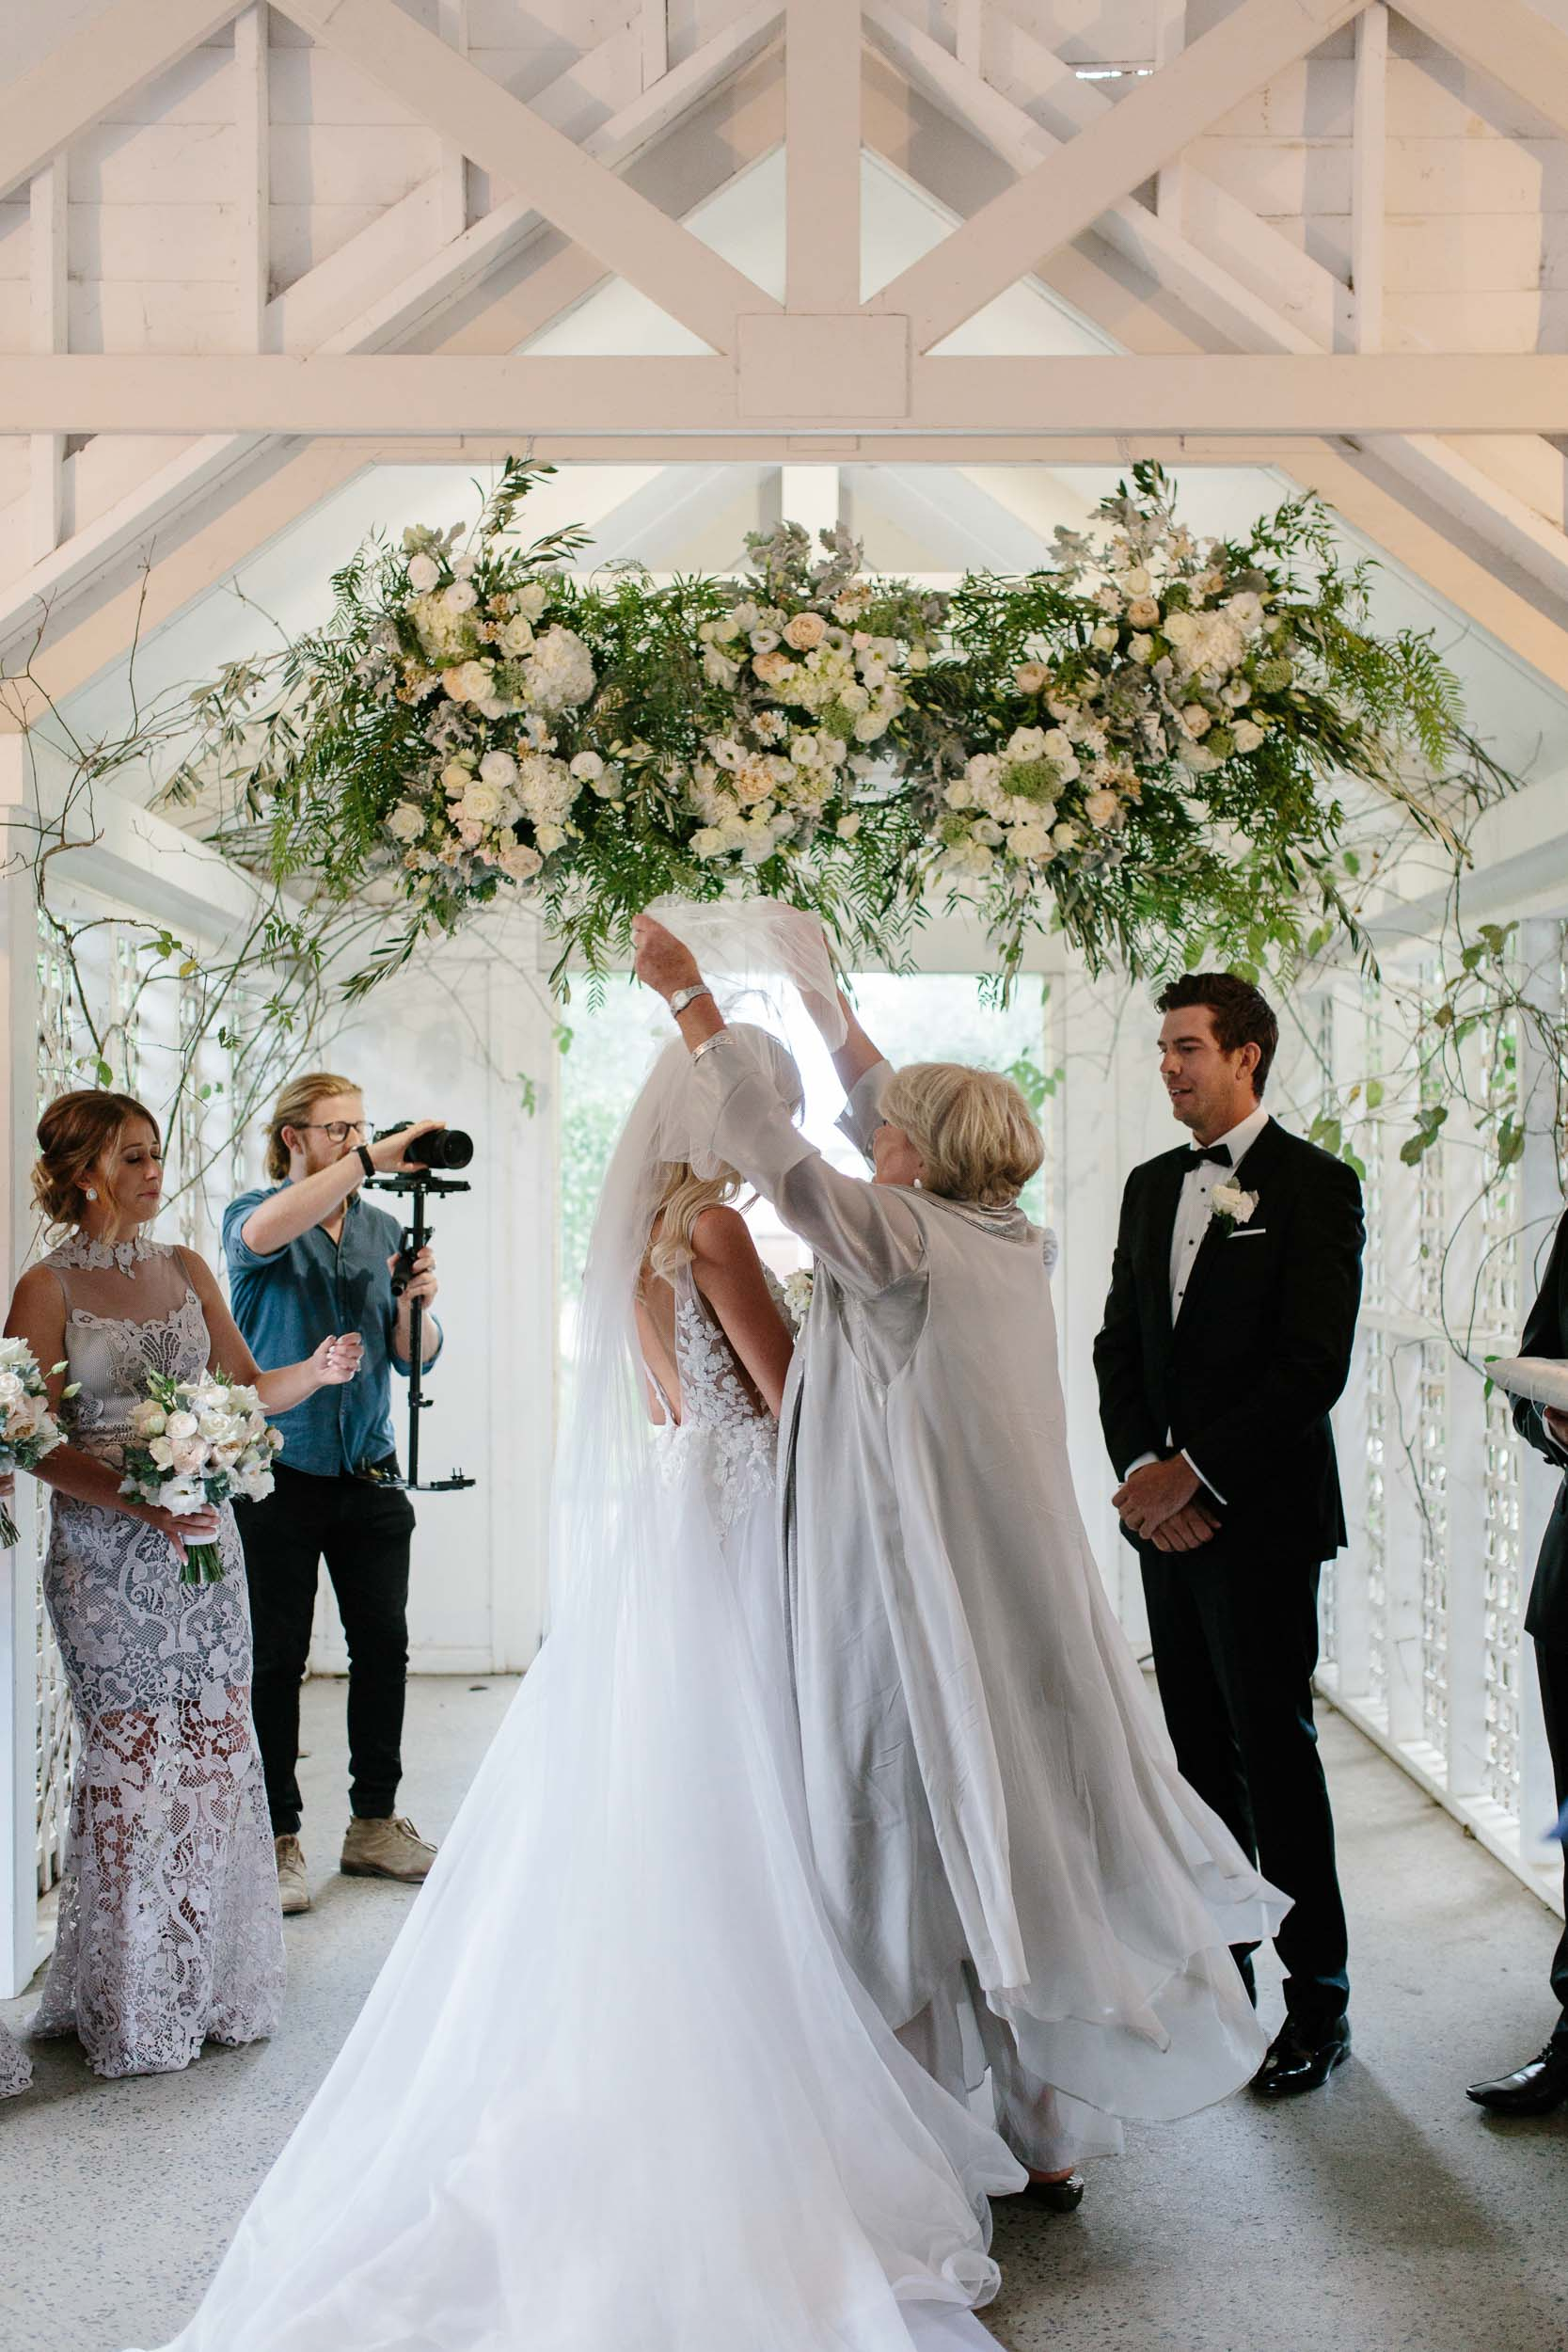 Kas-Richards-Mornington-Peninsula-Private-Property-Wedding-Marianna-Hardwick-Gown-234.jpg